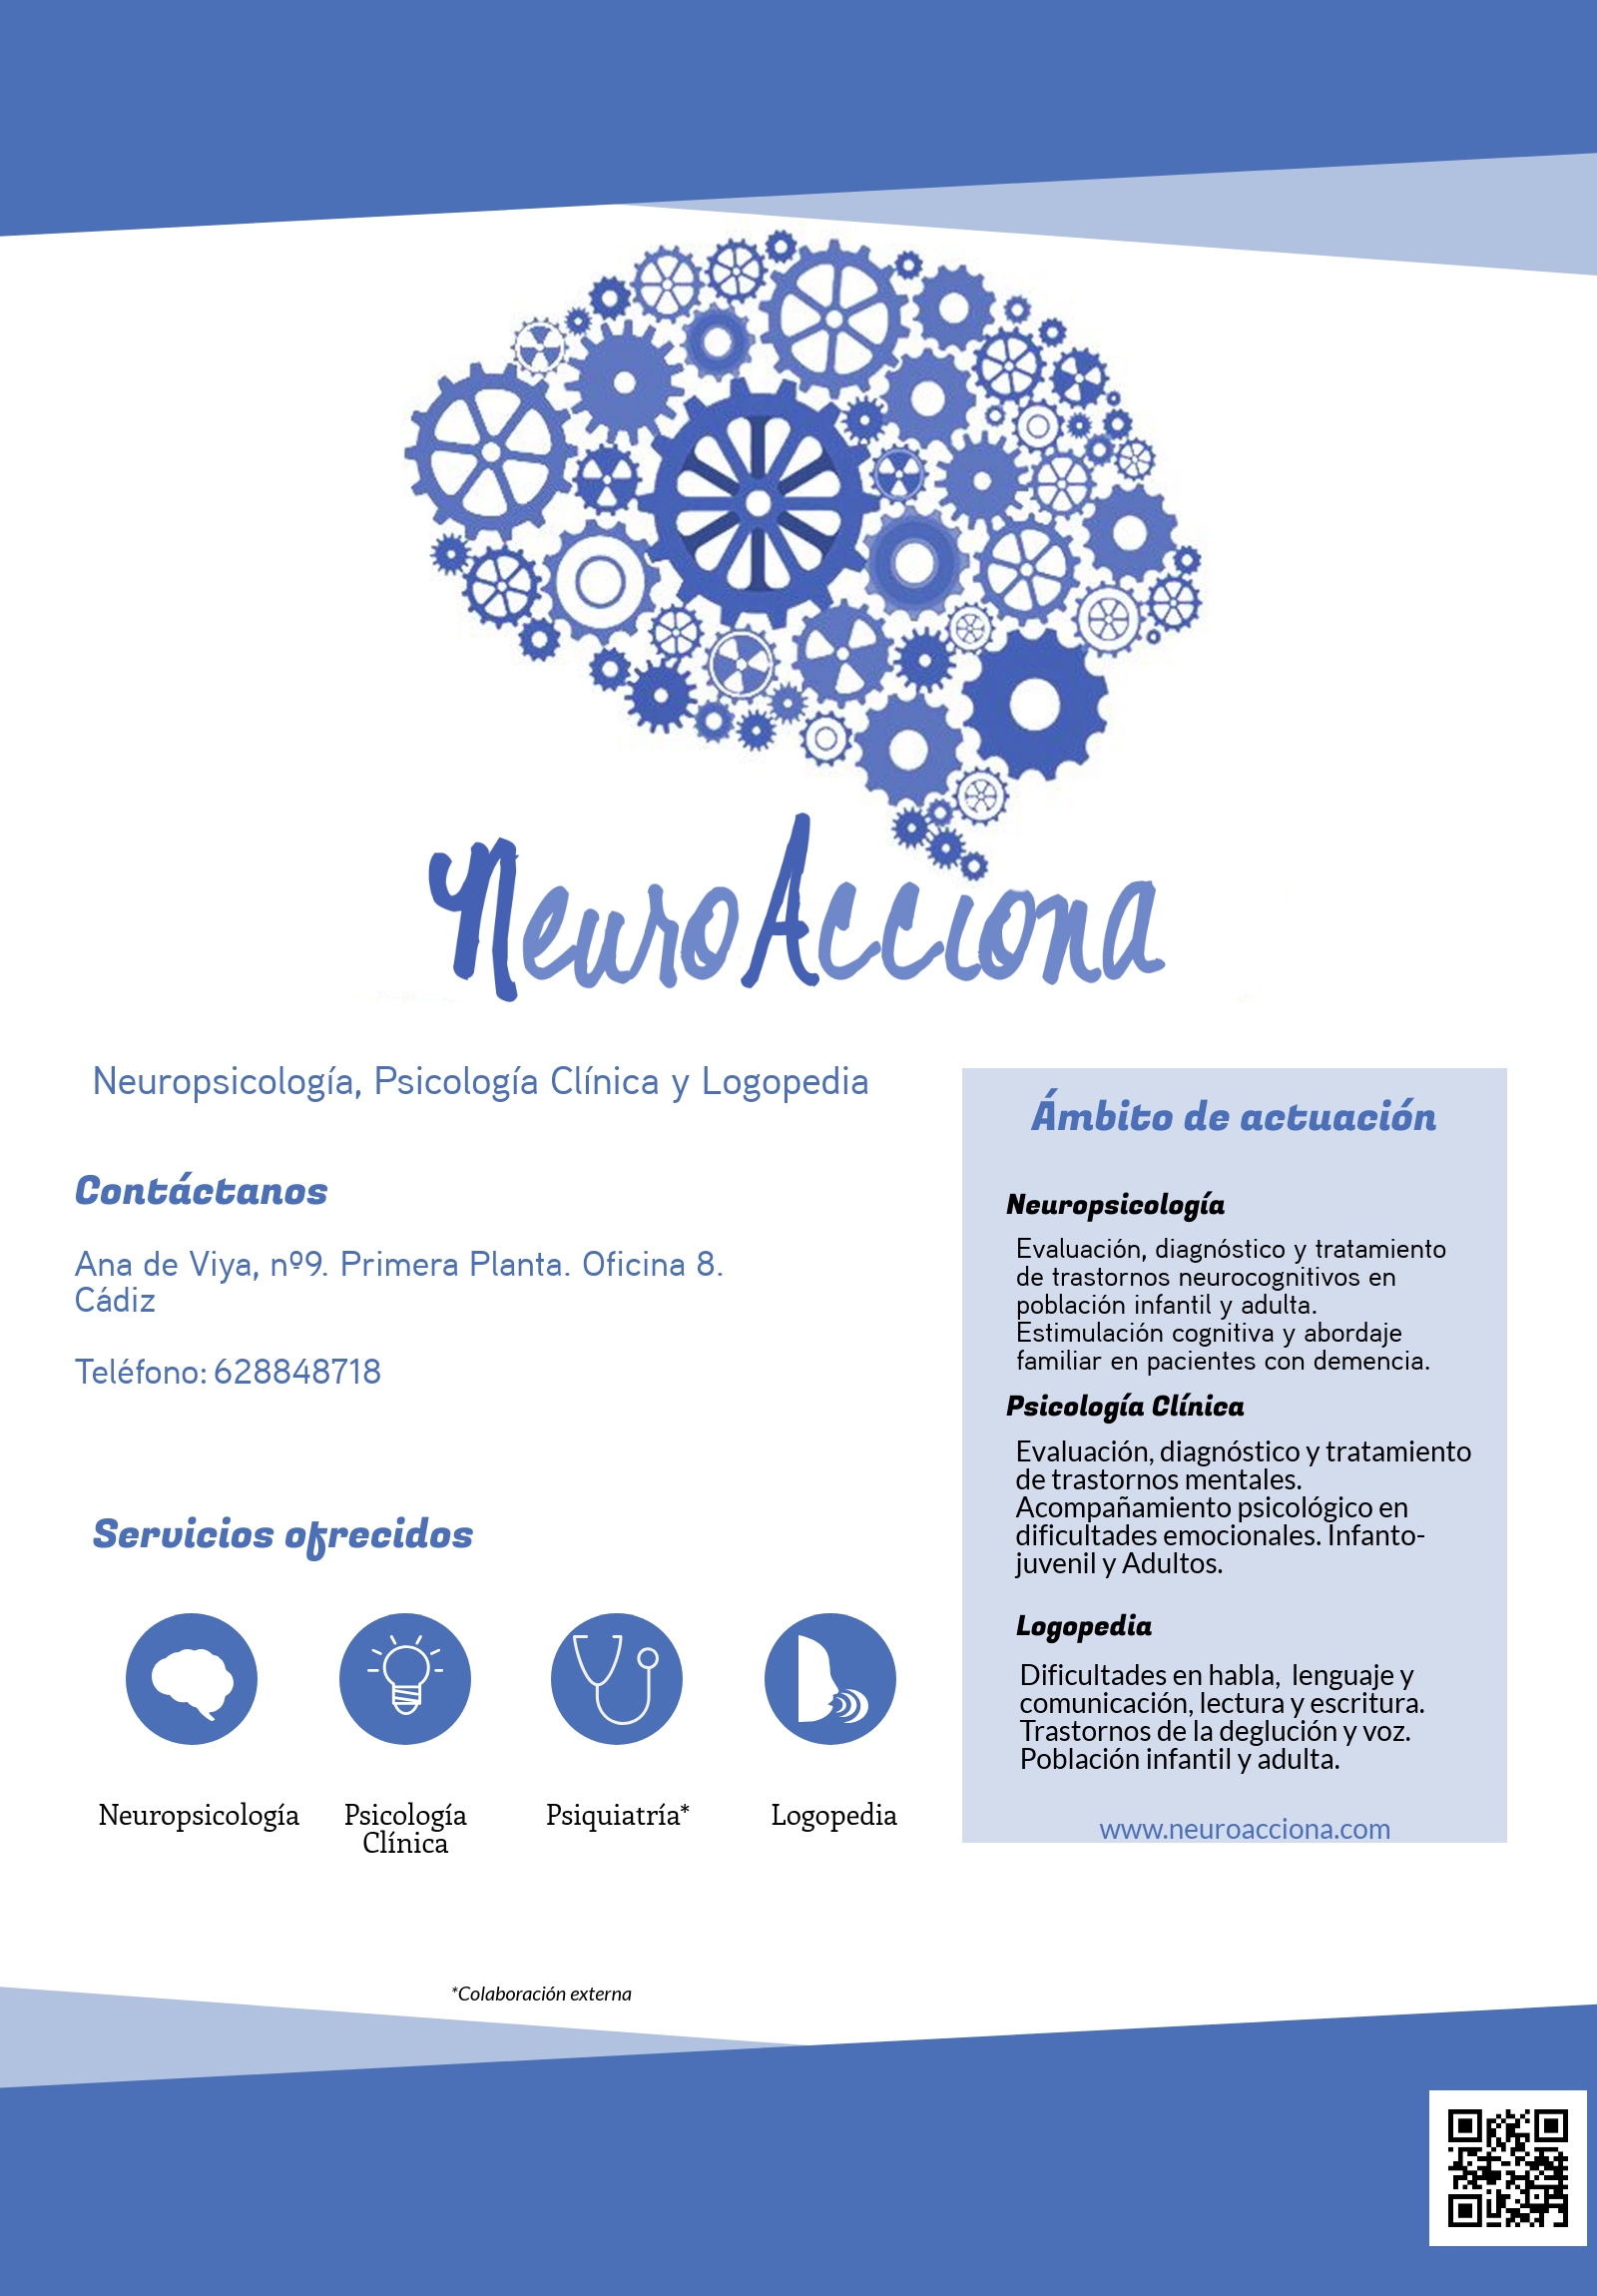 NEUROACCIONA